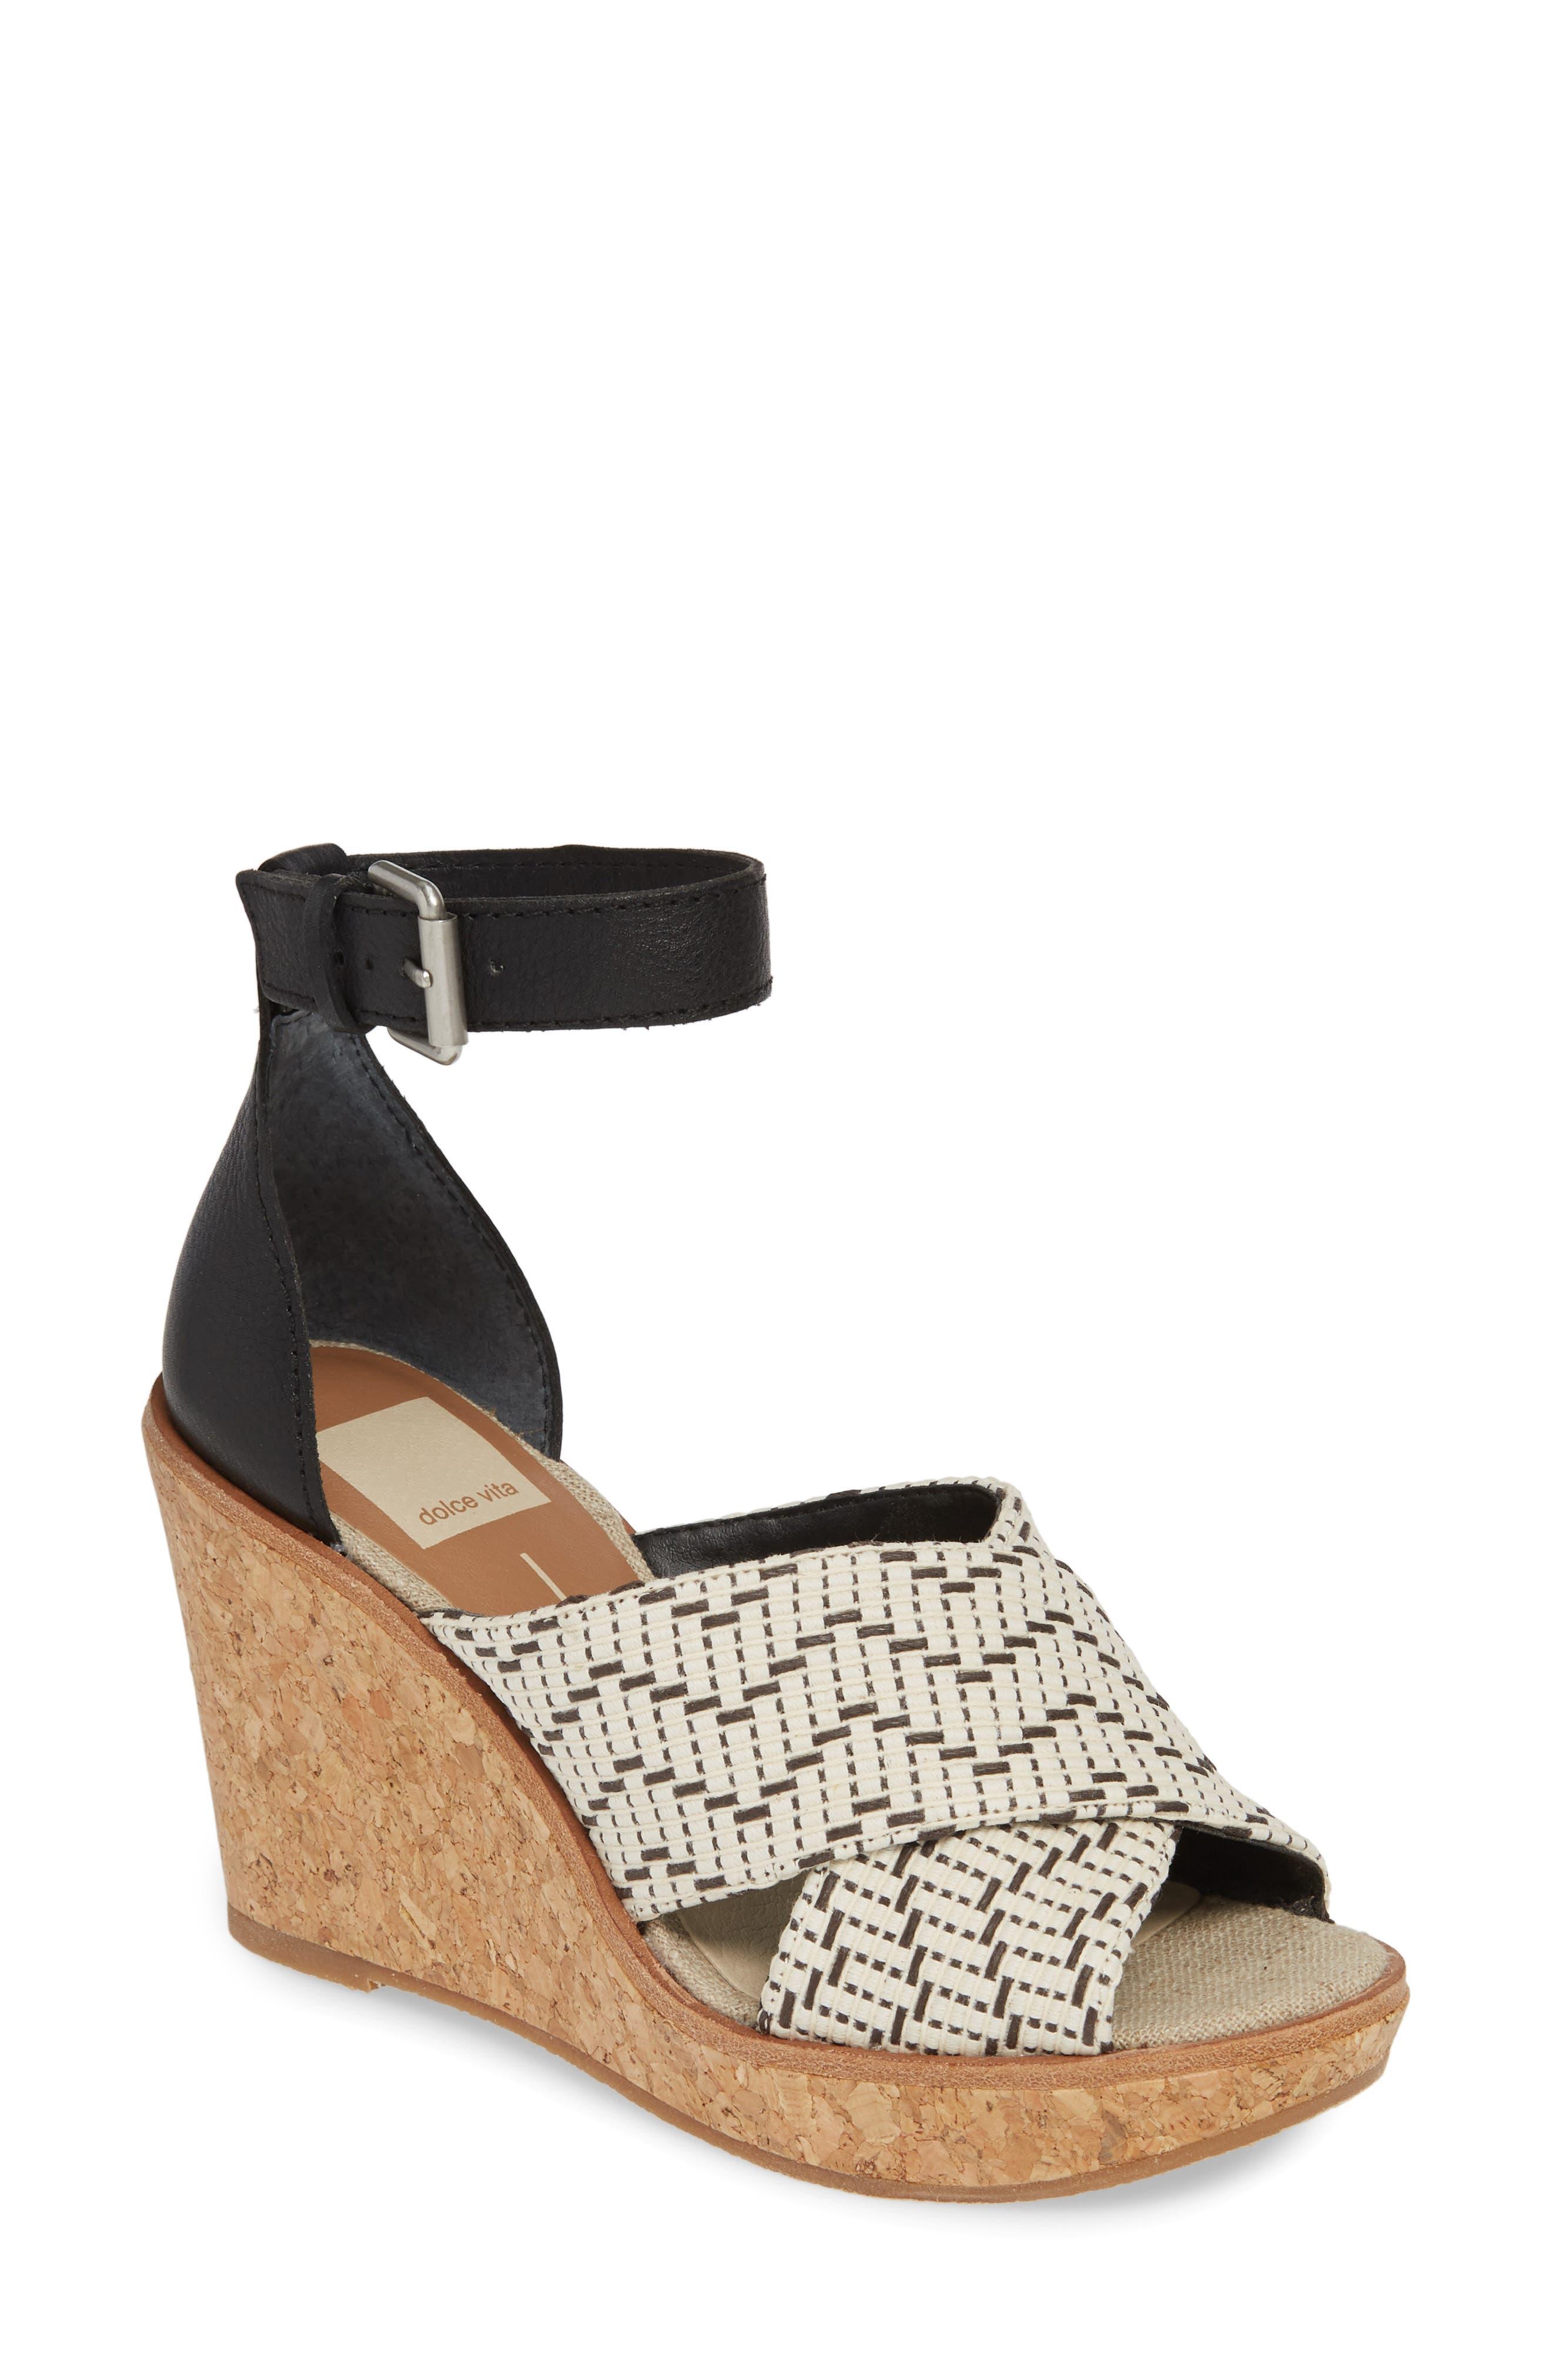 a9b1fed336f0 Dolce vita sandals